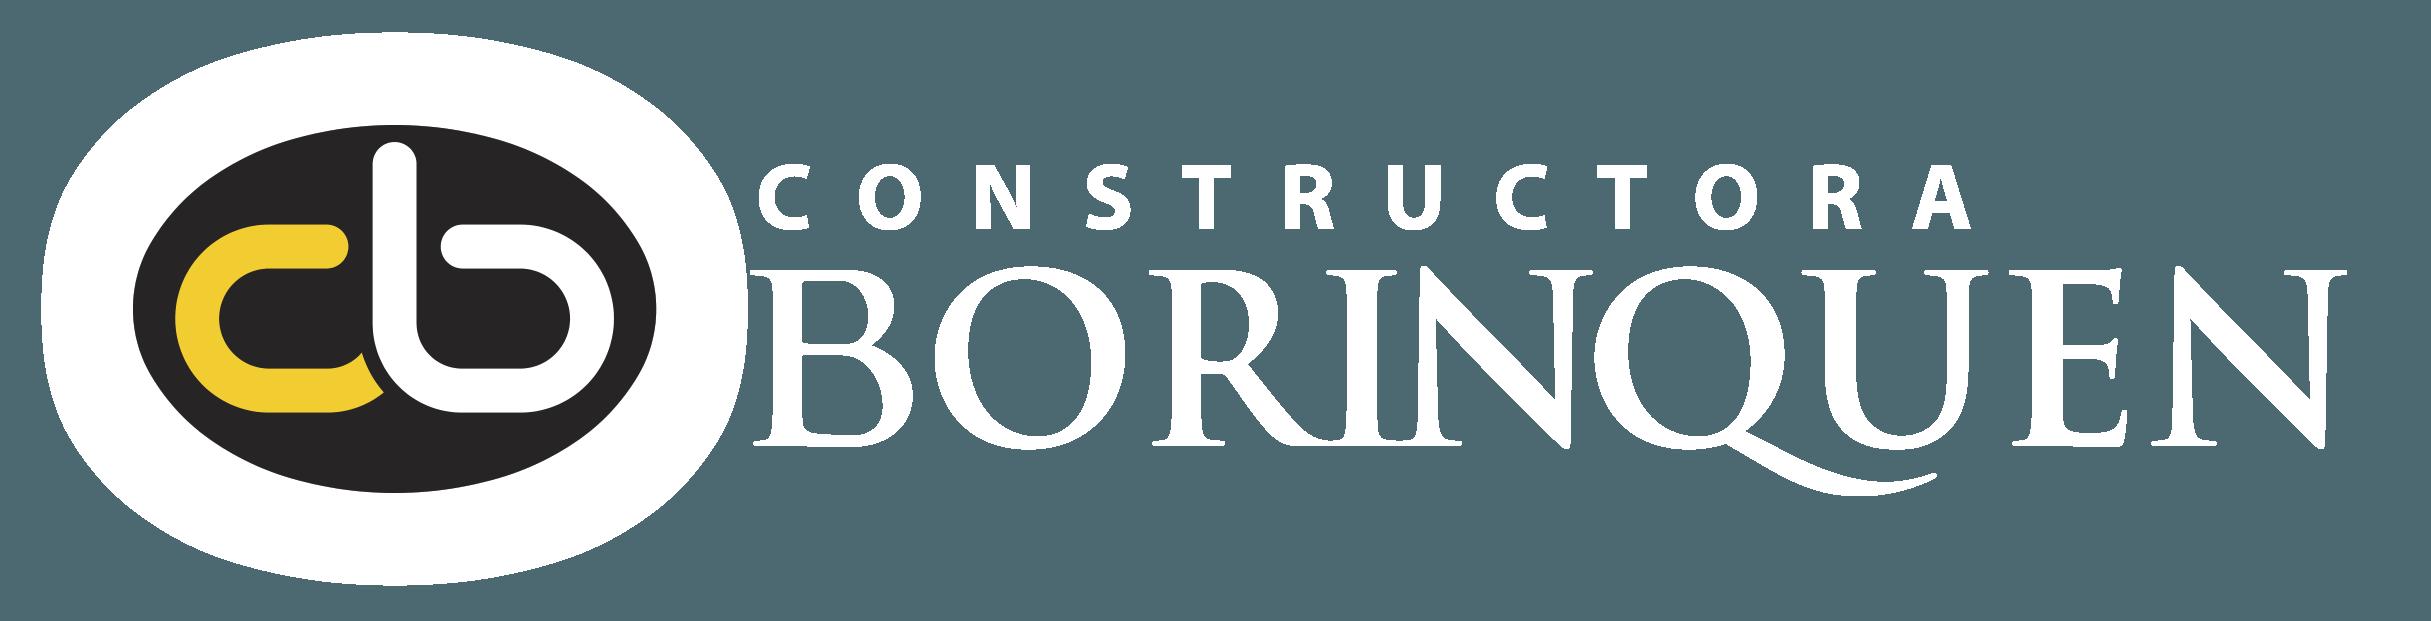 Logo Constructora Borinquen